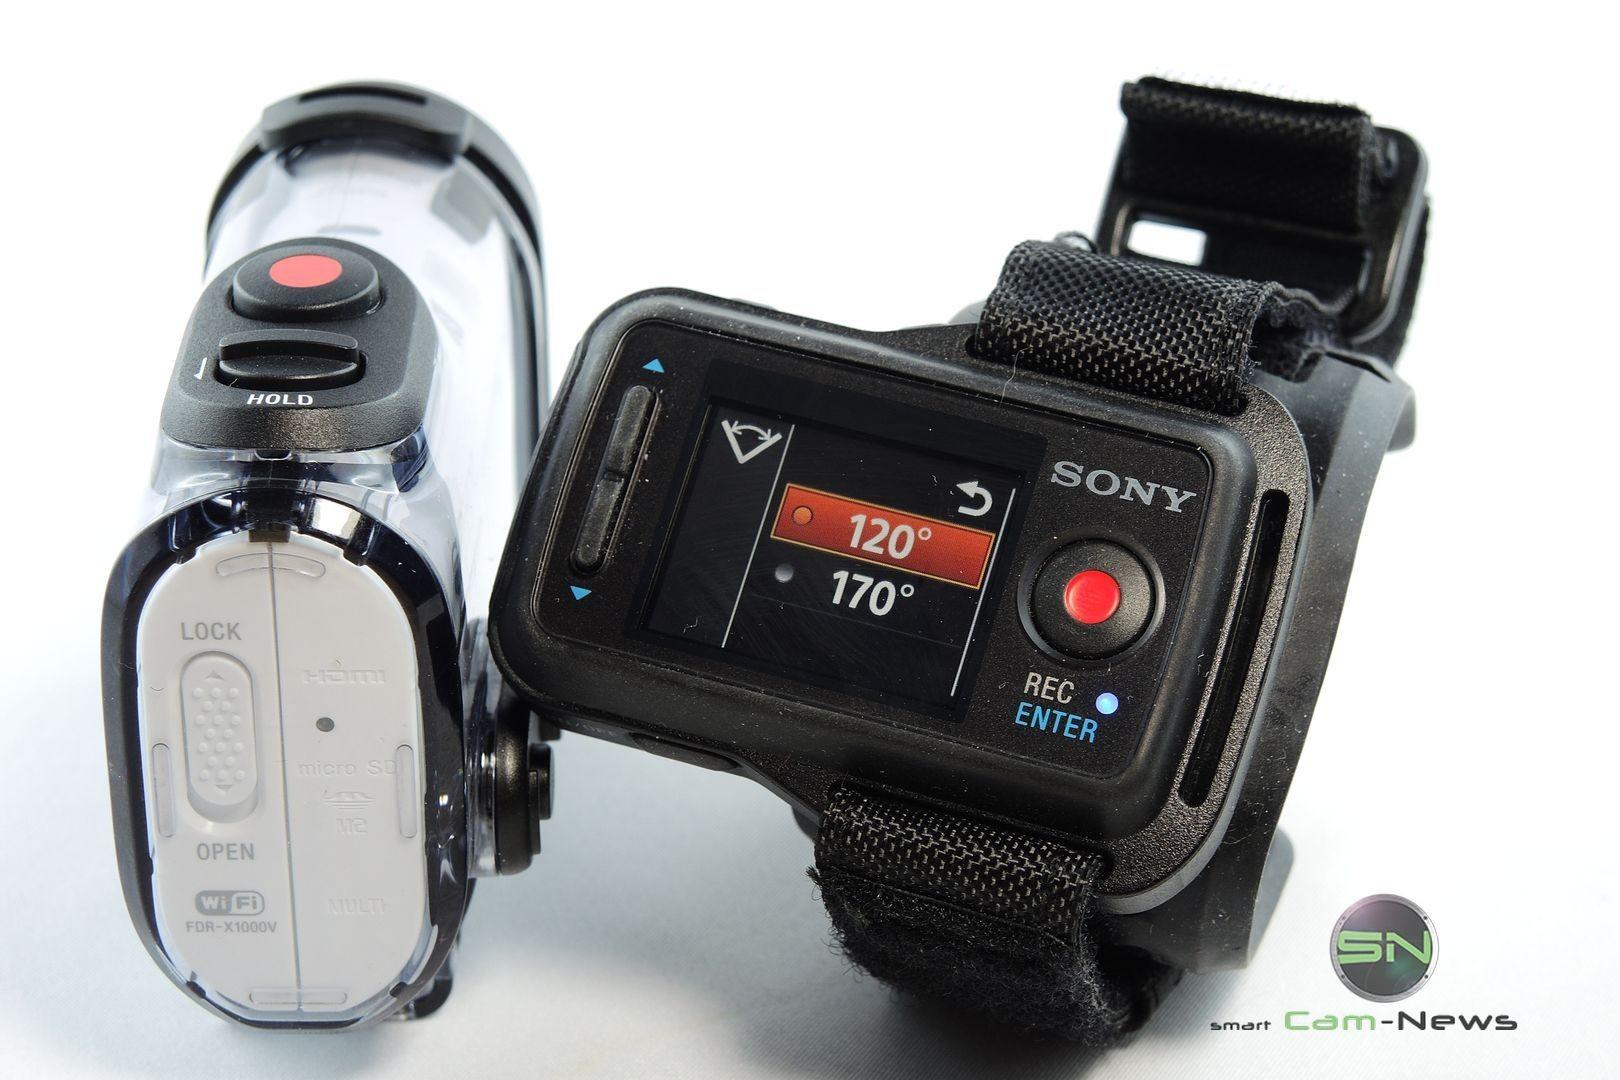 Koppelungsmodus Fernbedienung - ActionCam Sony X1000V - SmartCAMNews